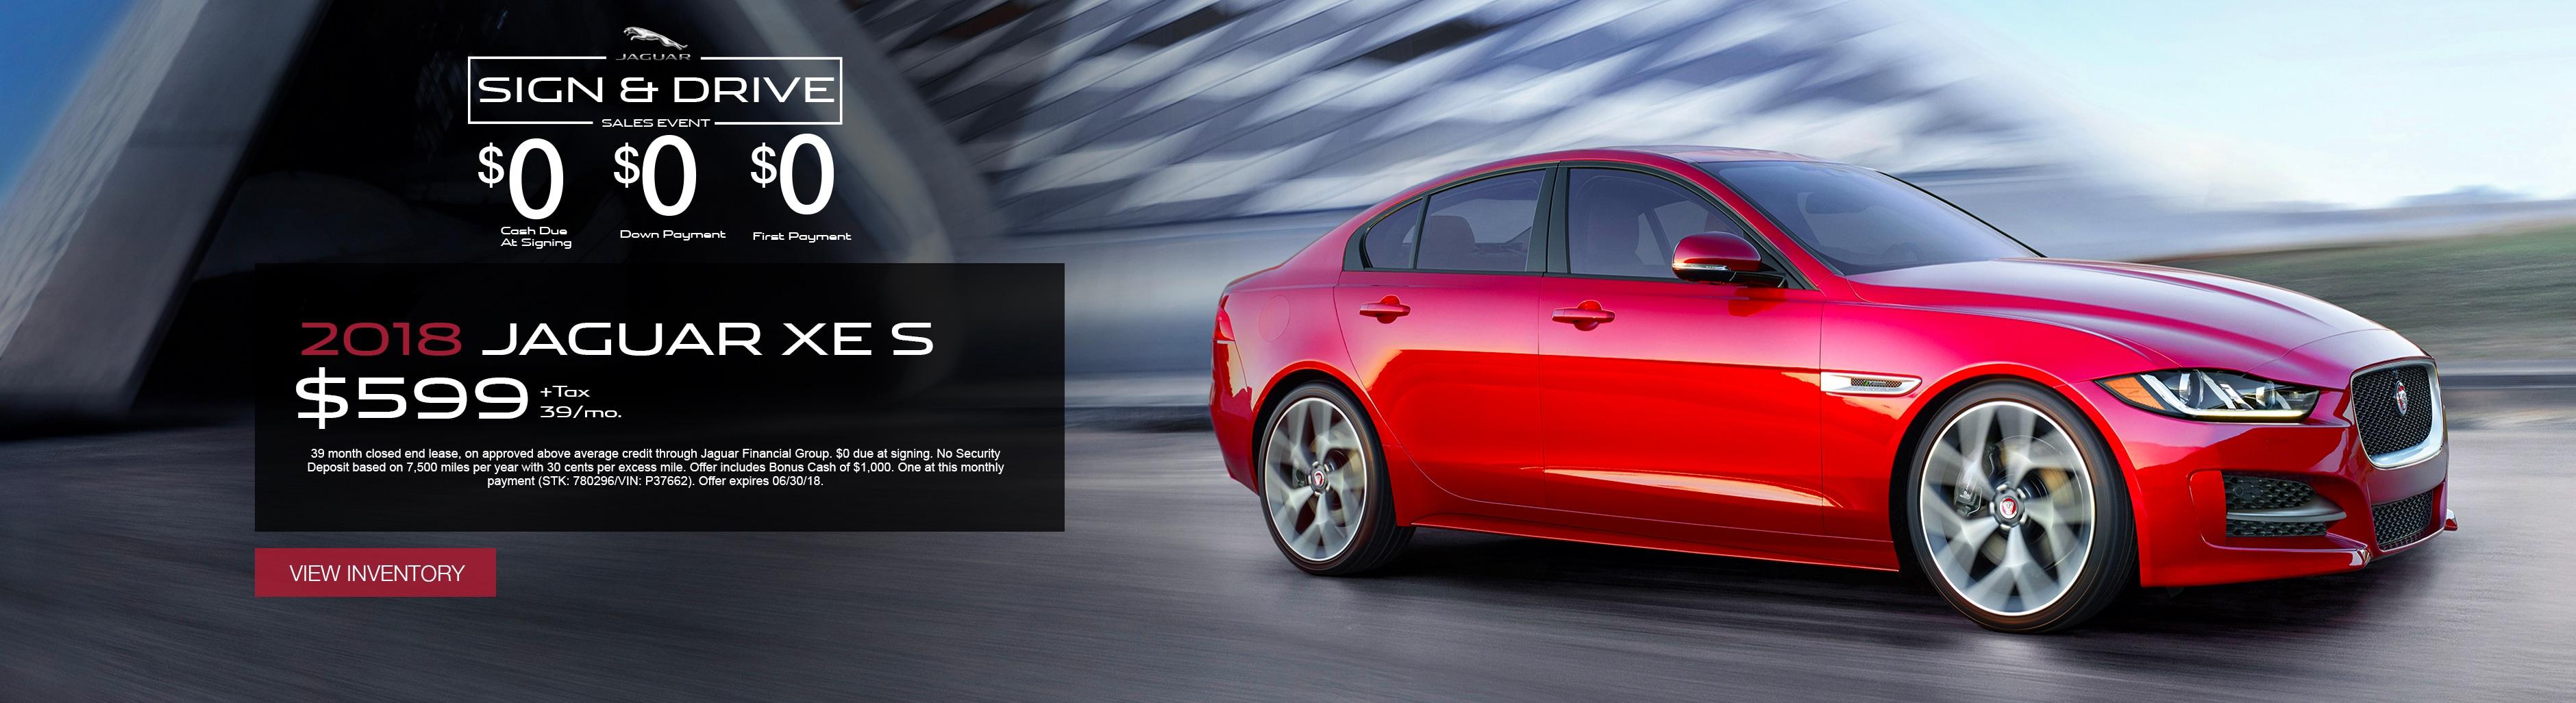 dealership land los myautoworld angeles com jaguar america brand north rover